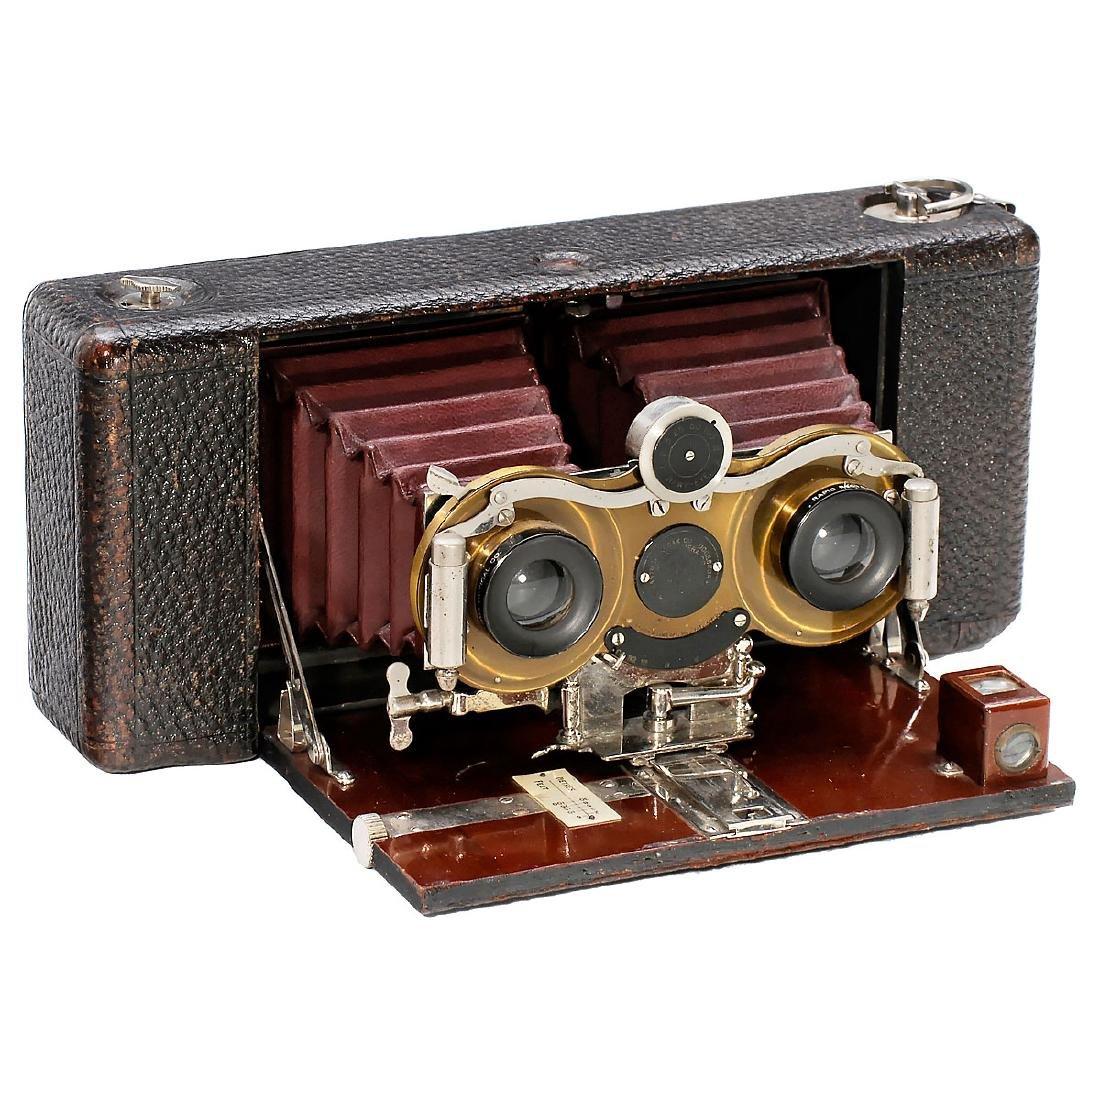 Blair Stereo Hawkeye Mod. 4, 1904